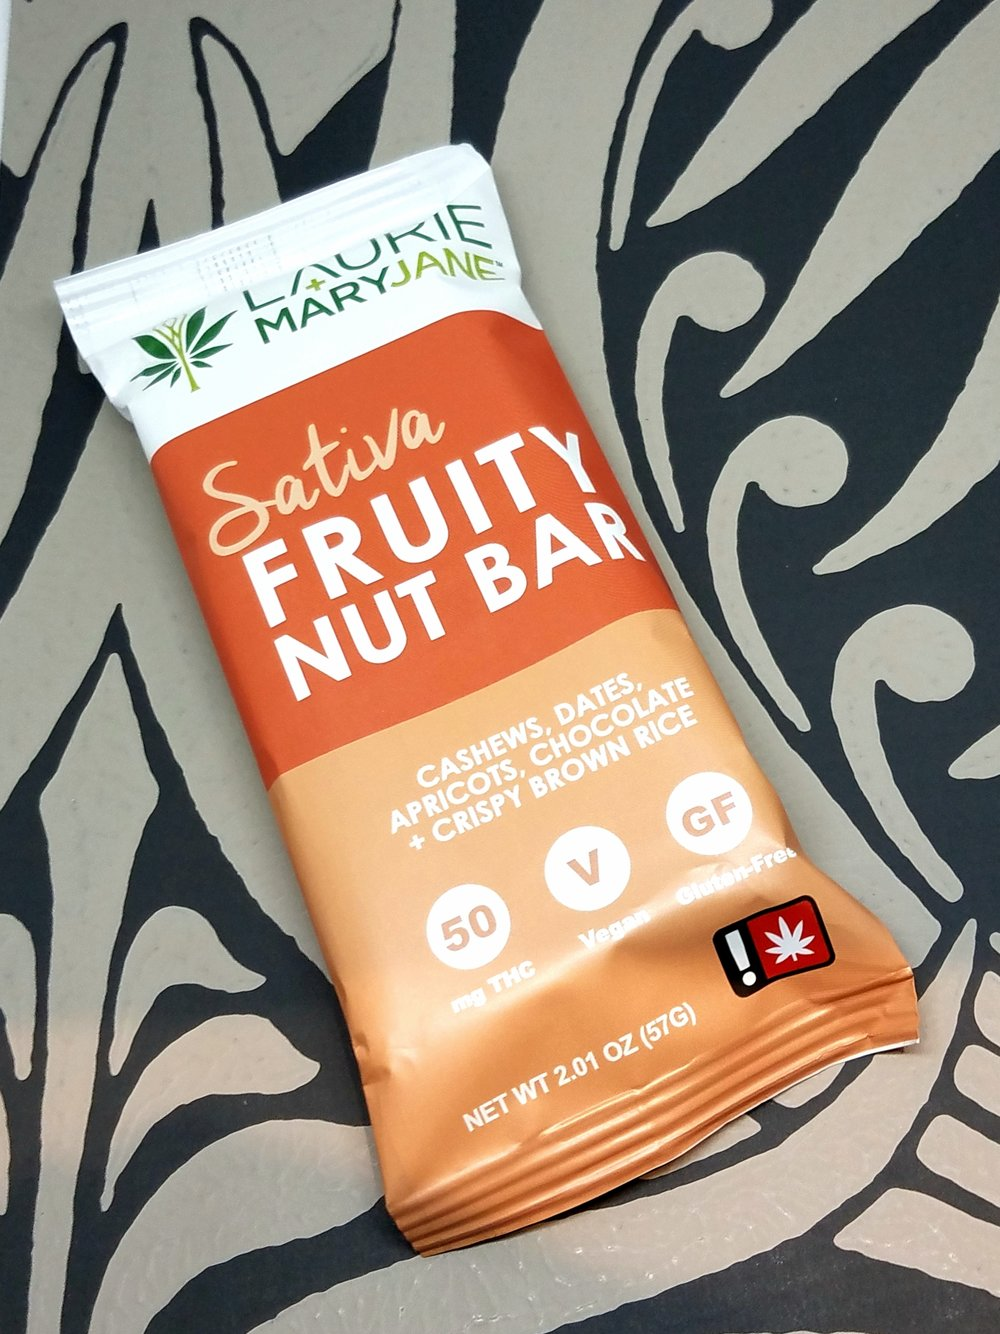 Sativa Fruity Nut Bar produced by Laurie + MaryJane